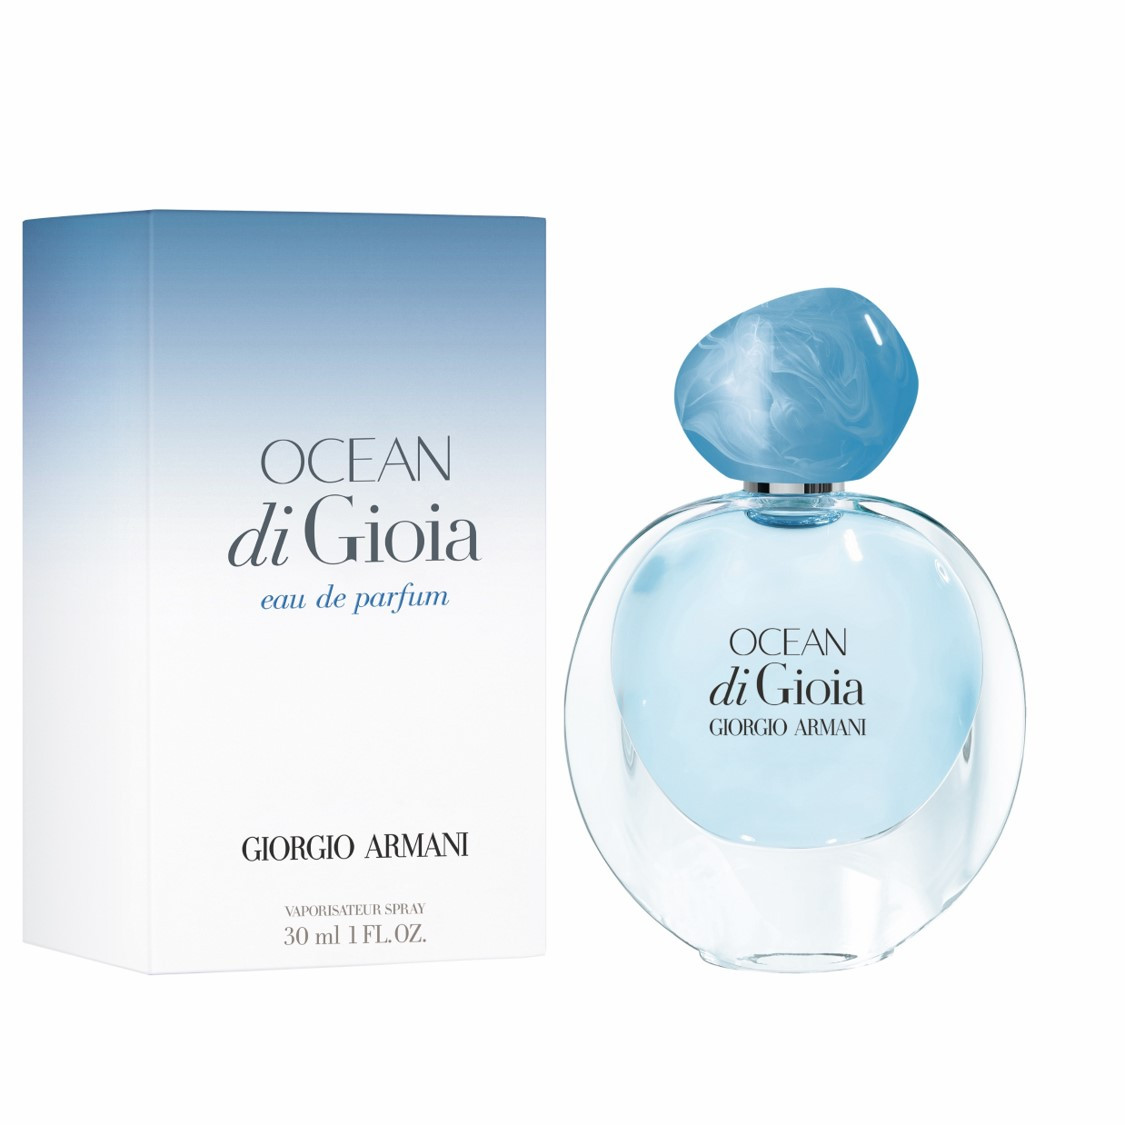 Giorgio Armani - Ocean di Gioia Eau de Parfum Spray -  30 ml